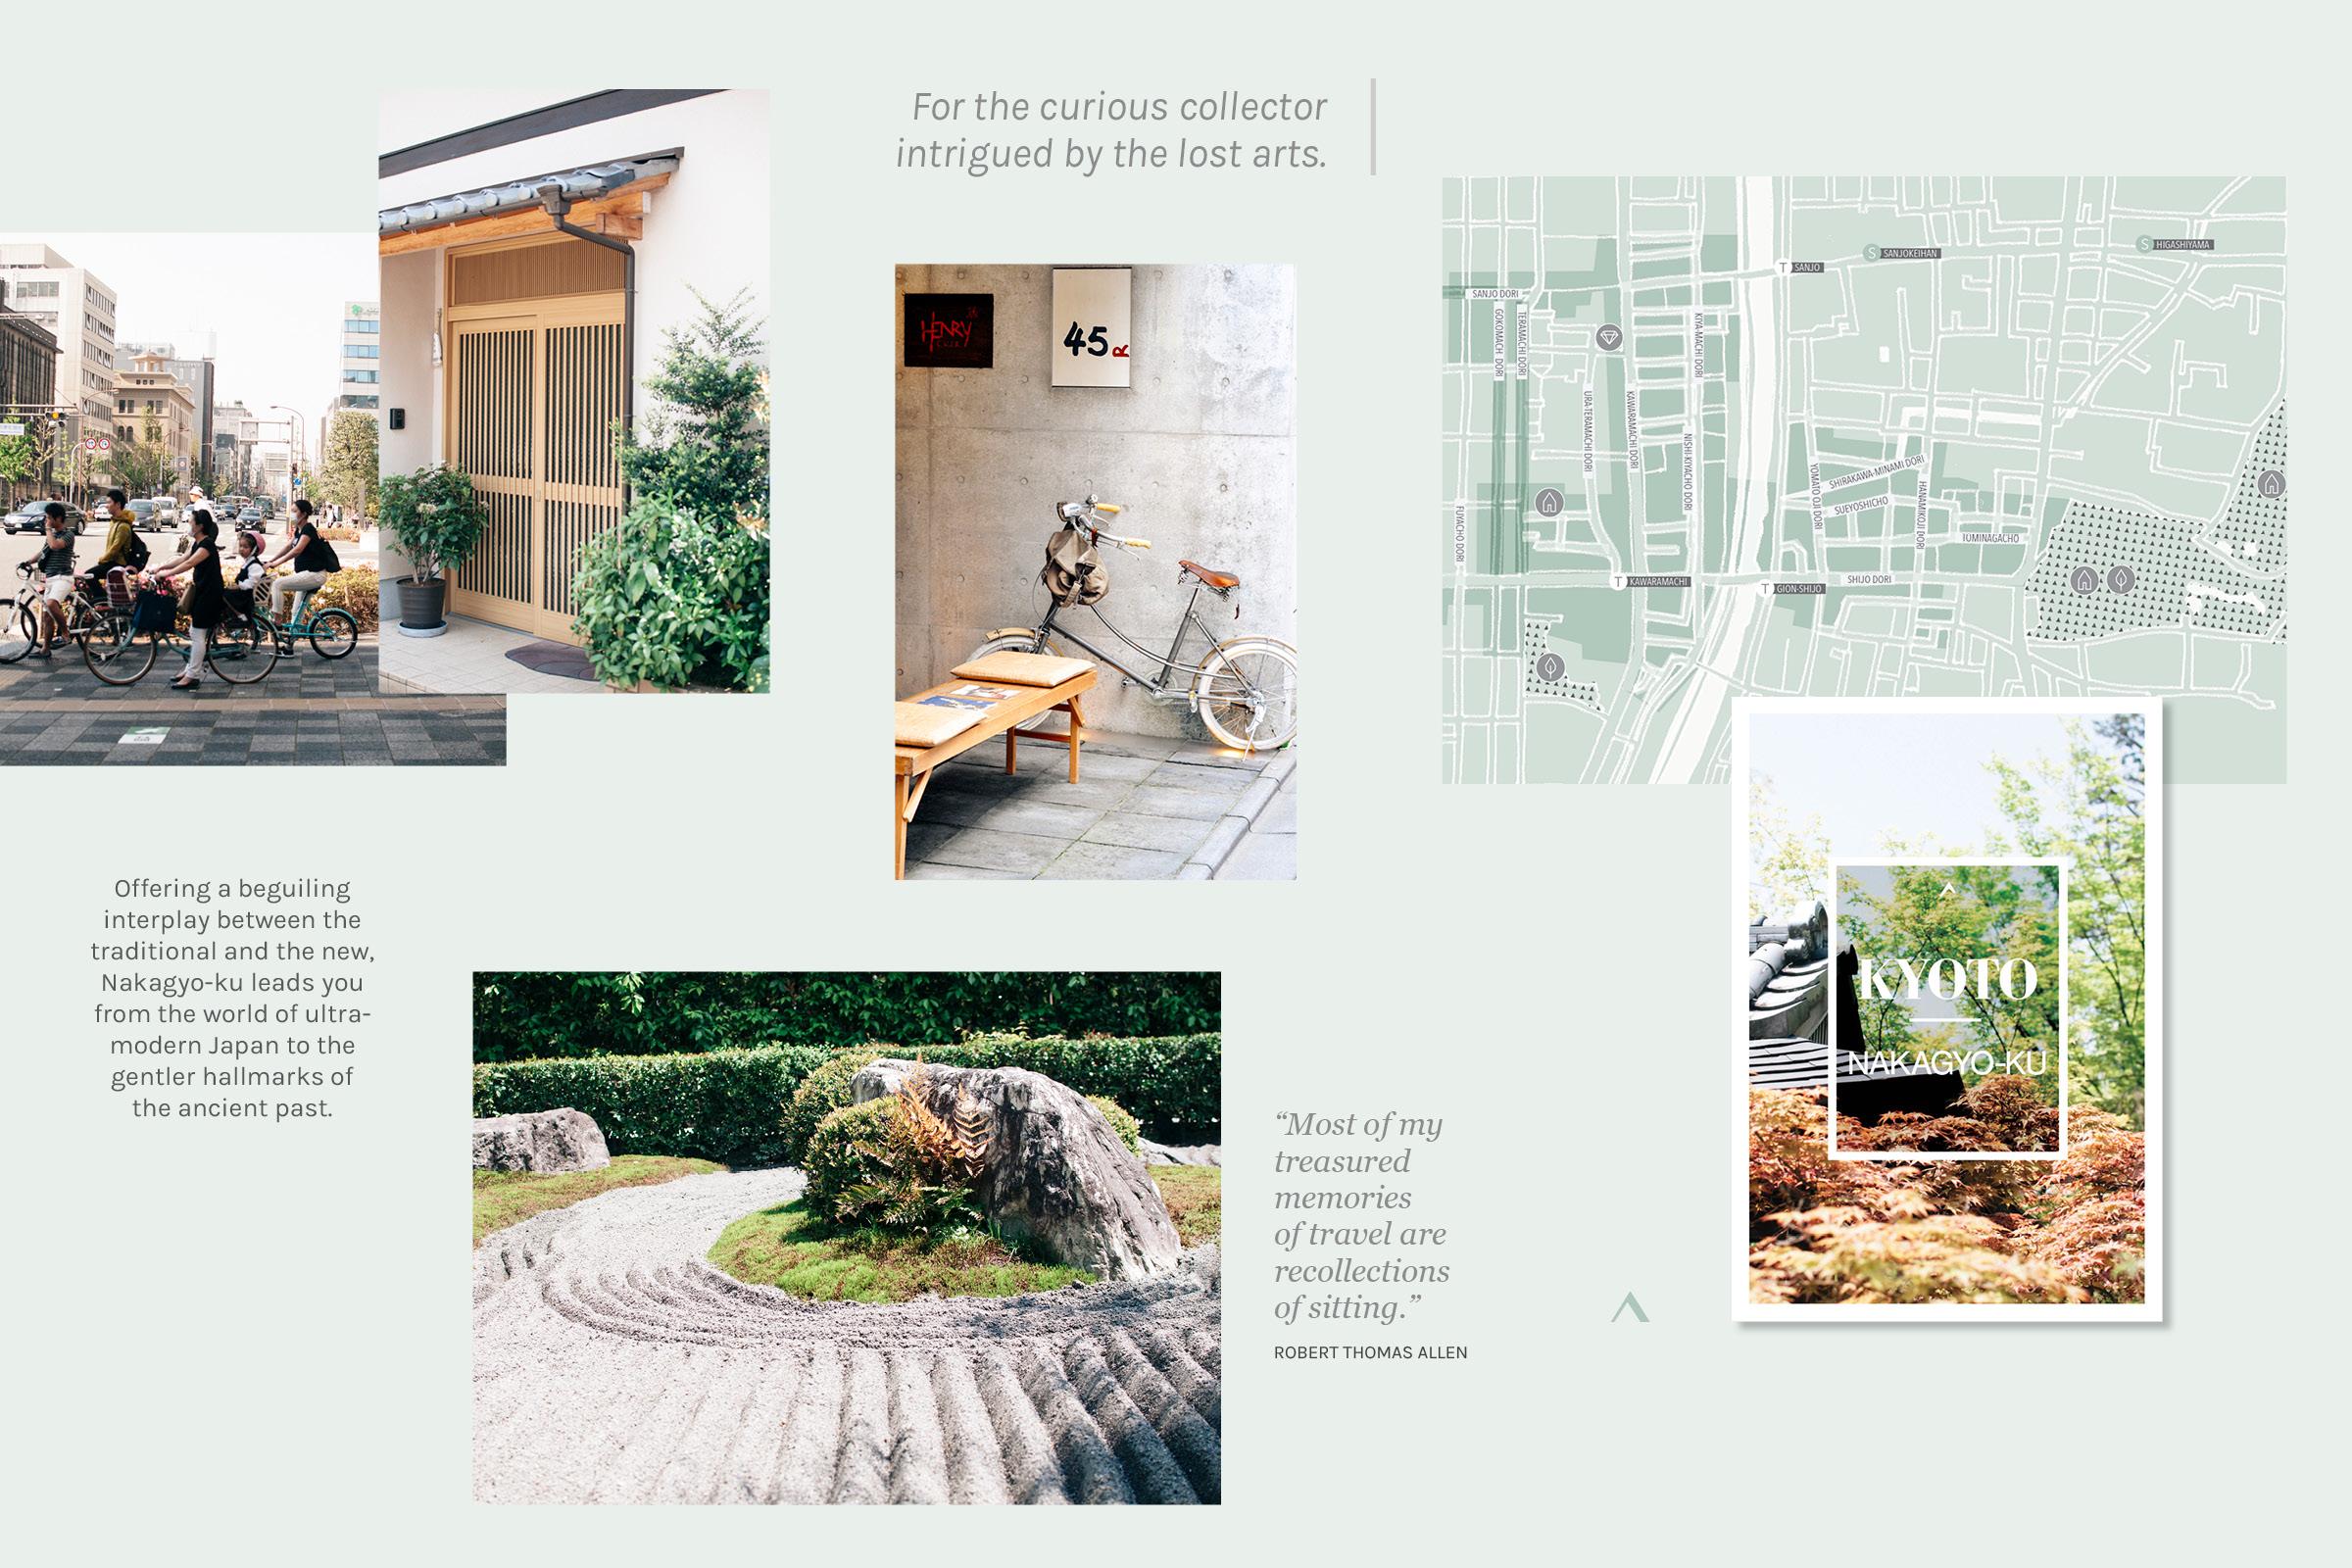 etre_kyoto_squares_web.jpg